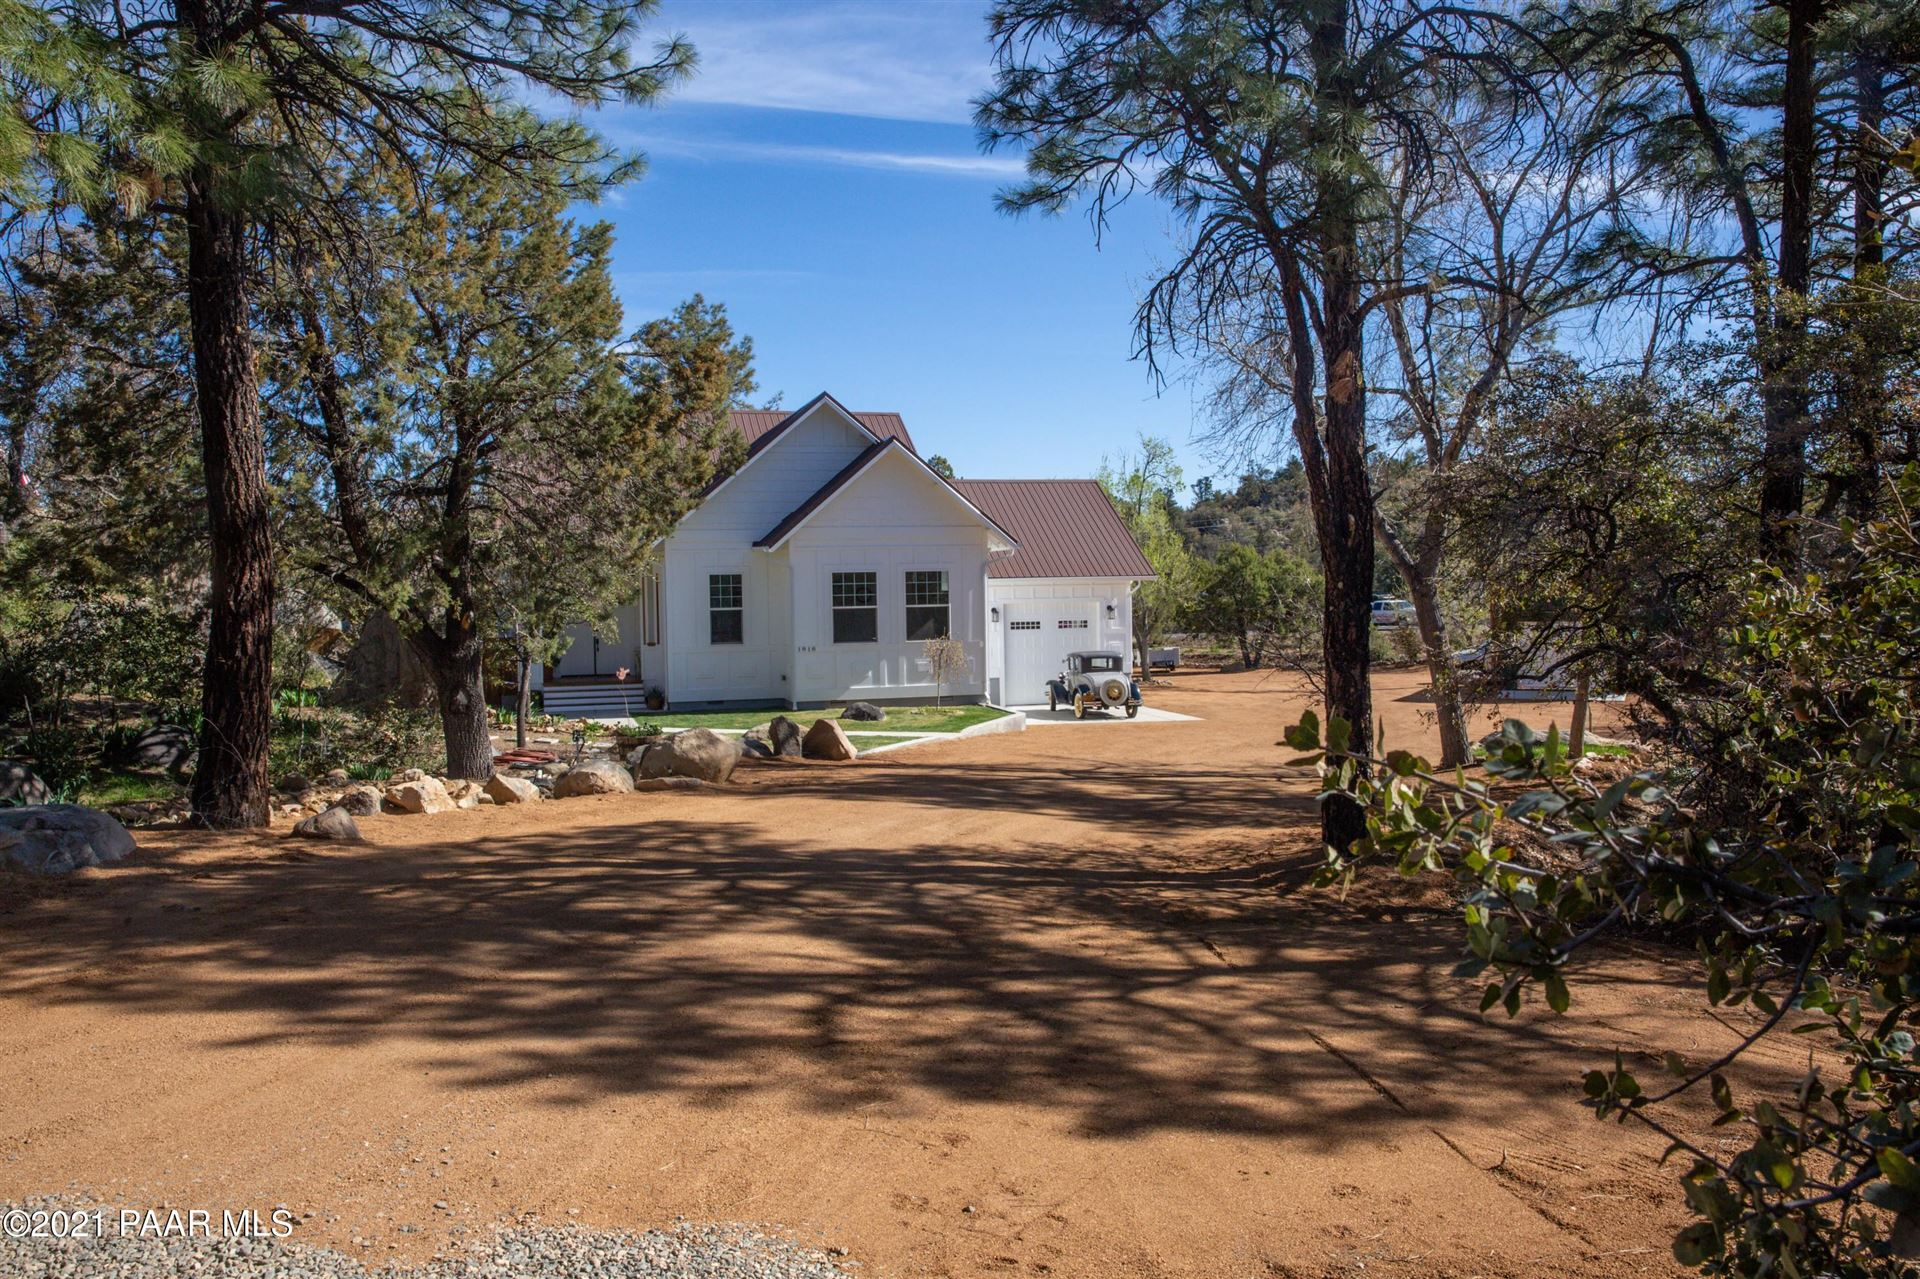 Photo of 1818 Mt Granite Way, Prescott, AZ 86305 (MLS # 1037582)